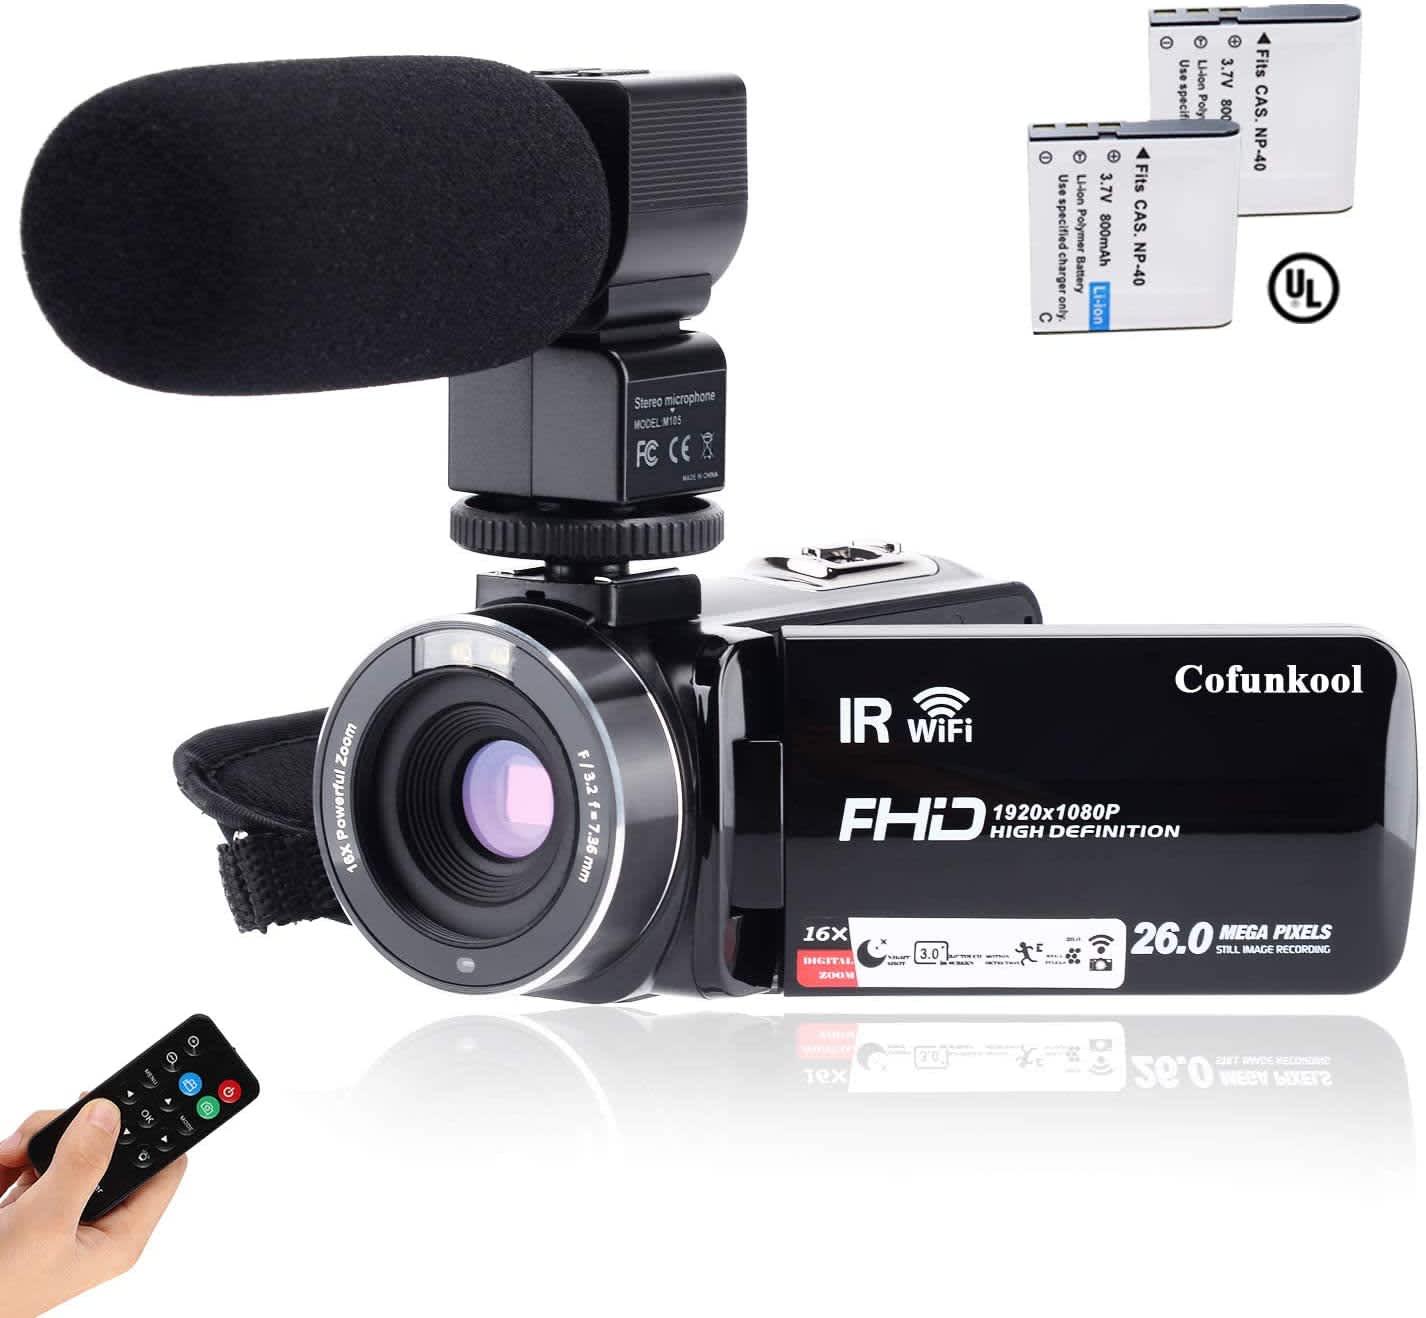 CofunKool 1080p Camcorder